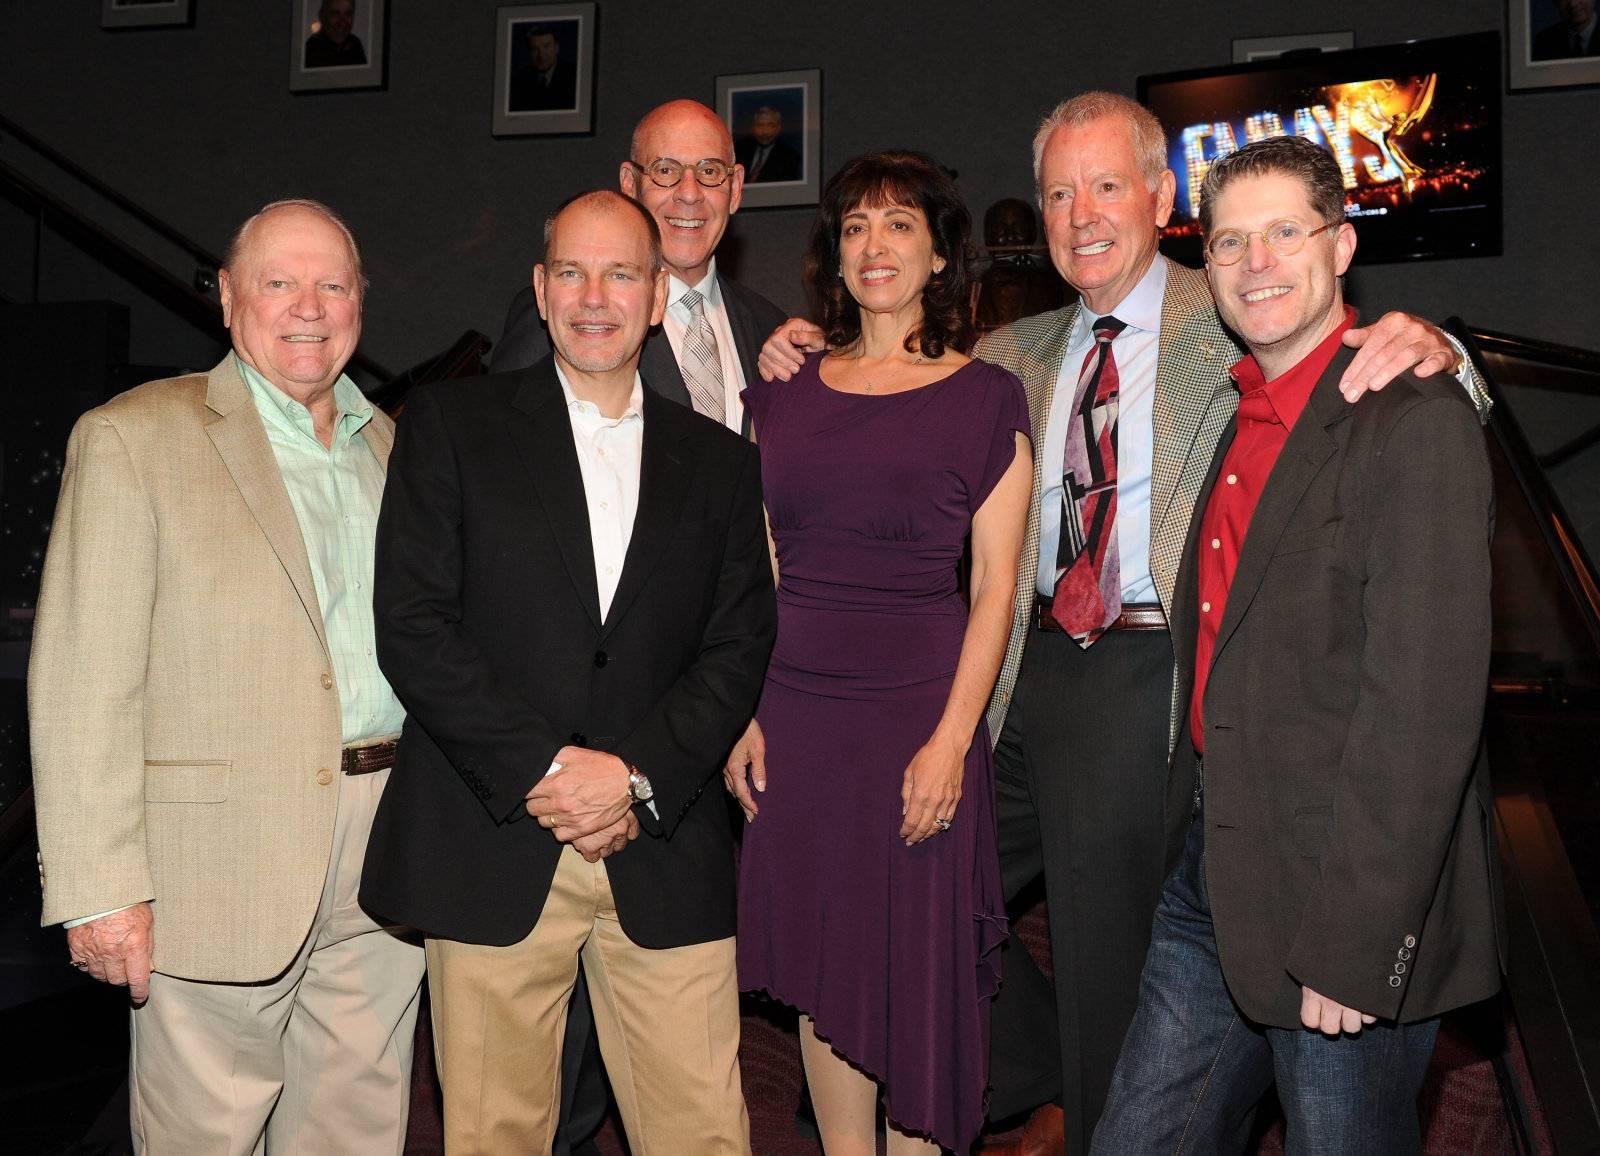 Conrad Bachmann, John Fisher, Joe Stewart, Geriann McIntosh, Russ Patrick, Bob Bergen